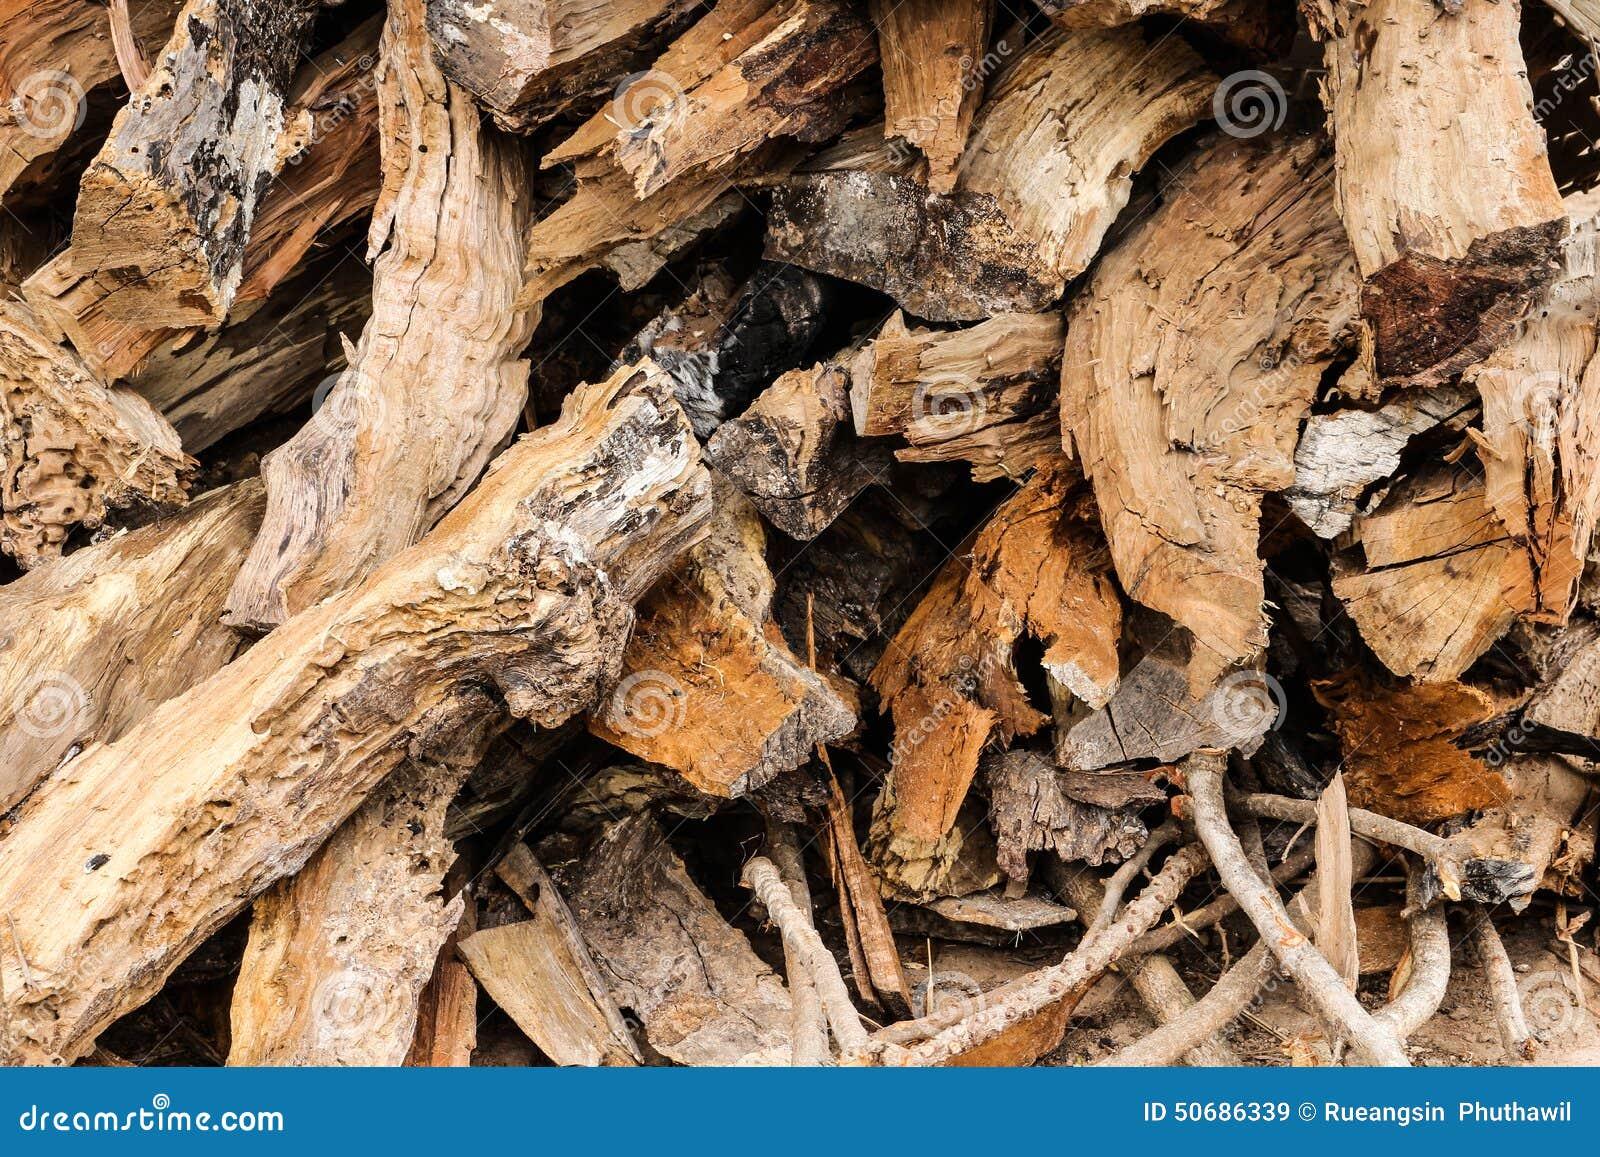 Download 背景 库存图片. 图片 包括有 背包, 树干, 木材, 日志, woodpile, 空白, 材料, 冬天 - 50686339